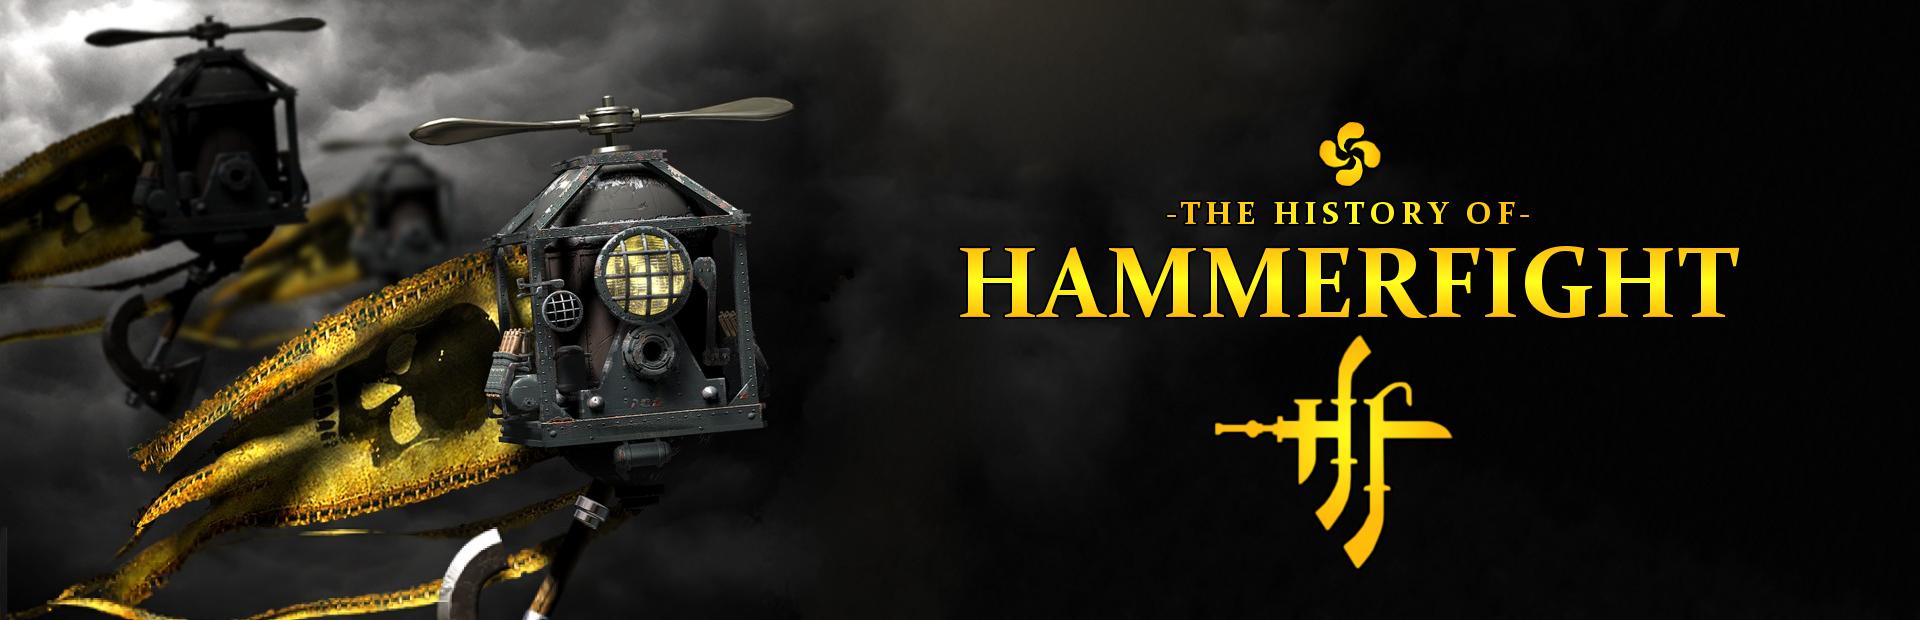 Hammerfight Header Image